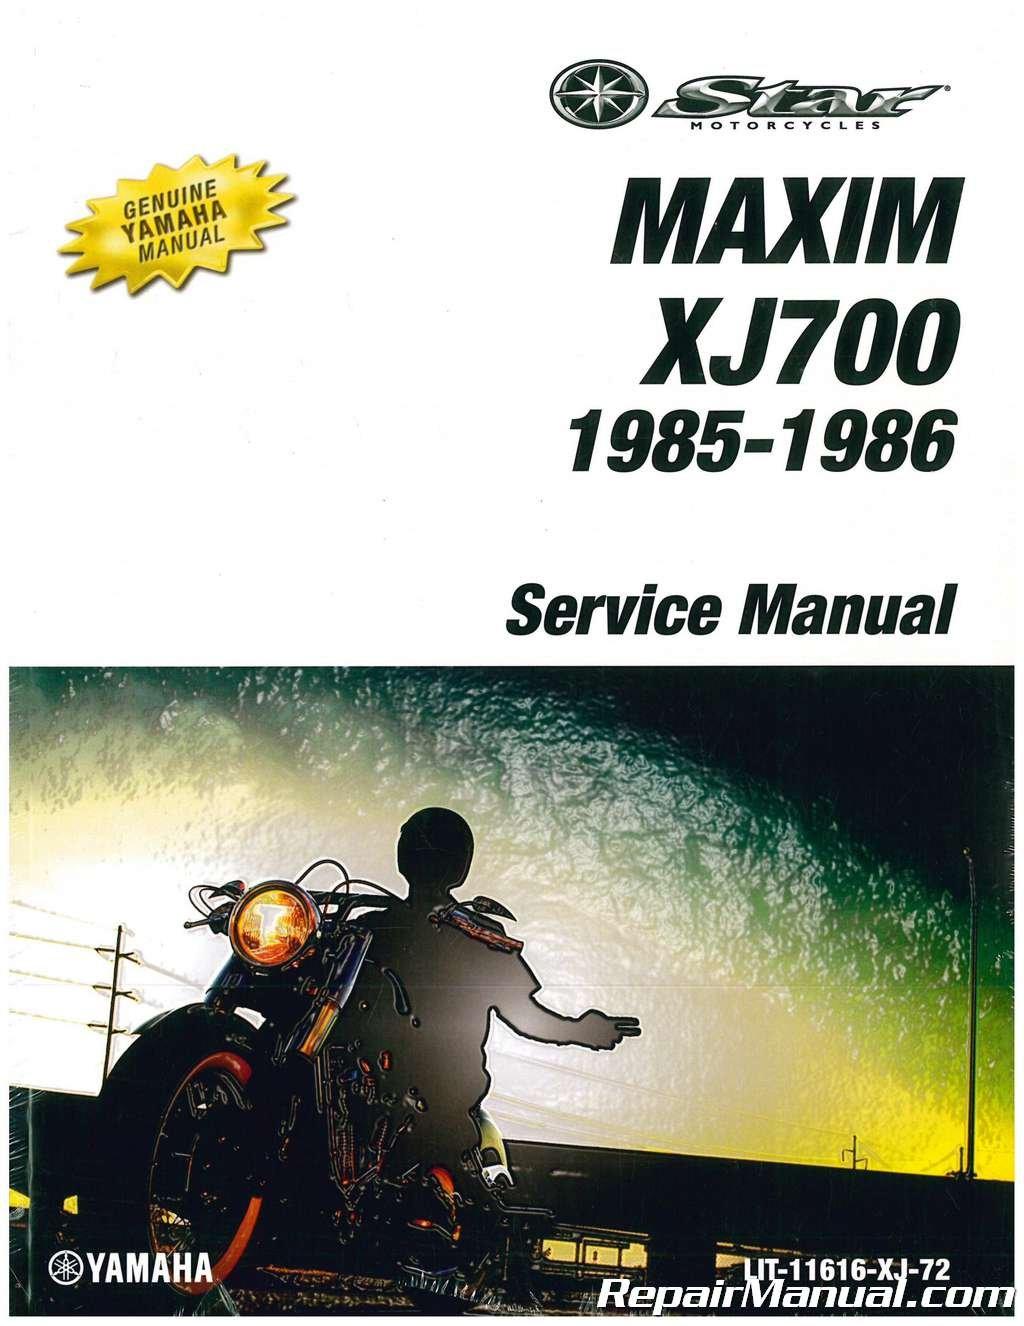 Lit 11616 xj 72 1985 1986 yamaha xj700 maxim motorcycle service lit 11616 xj 72 1985 1986 yamaha xj700 maxim motorcycle service manual manufacturer amazon books fandeluxe Choice Image